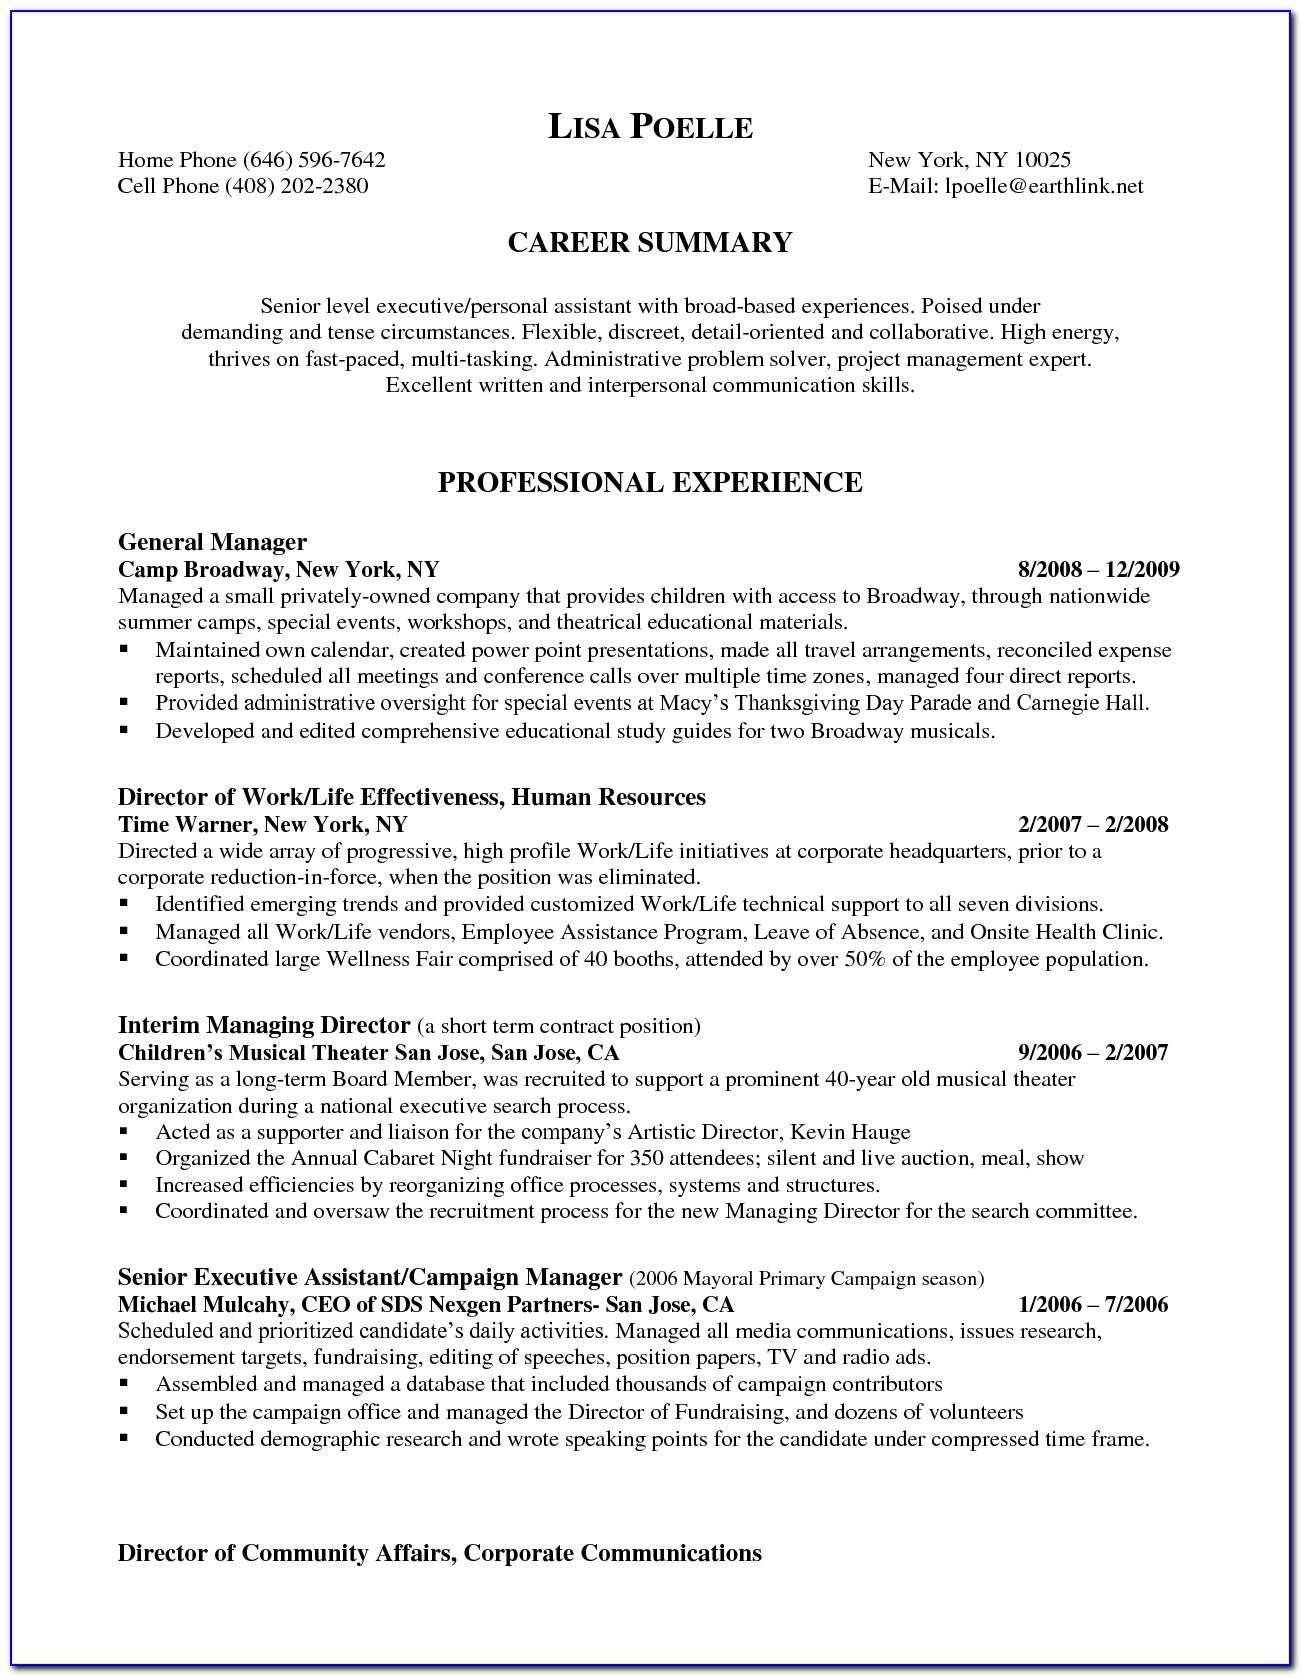 Resumes For Marketing Executives